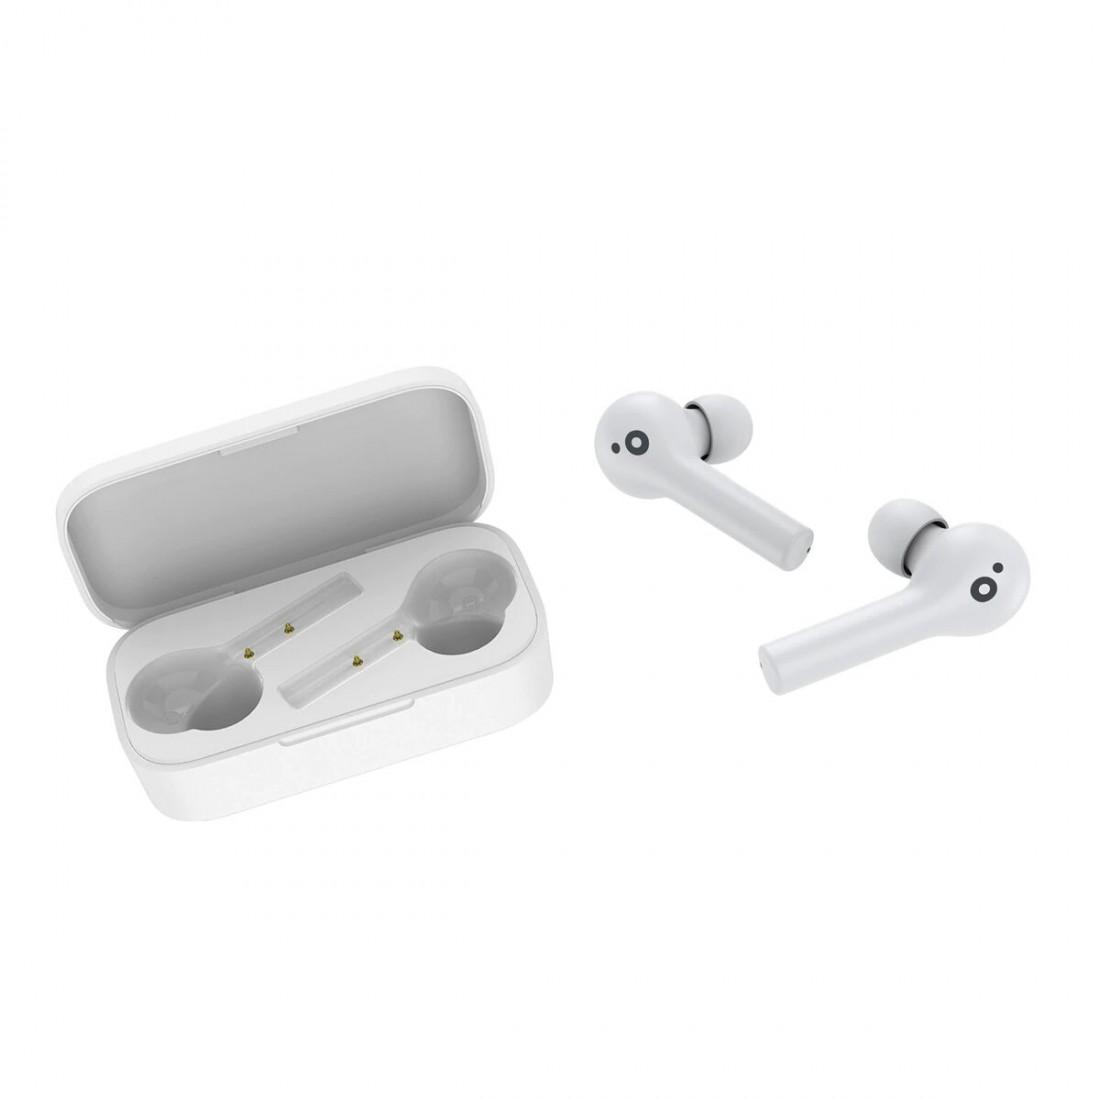 Auriculares inalámbricos SUNSTECH WAVEPODS TOUCH, Bluetooth